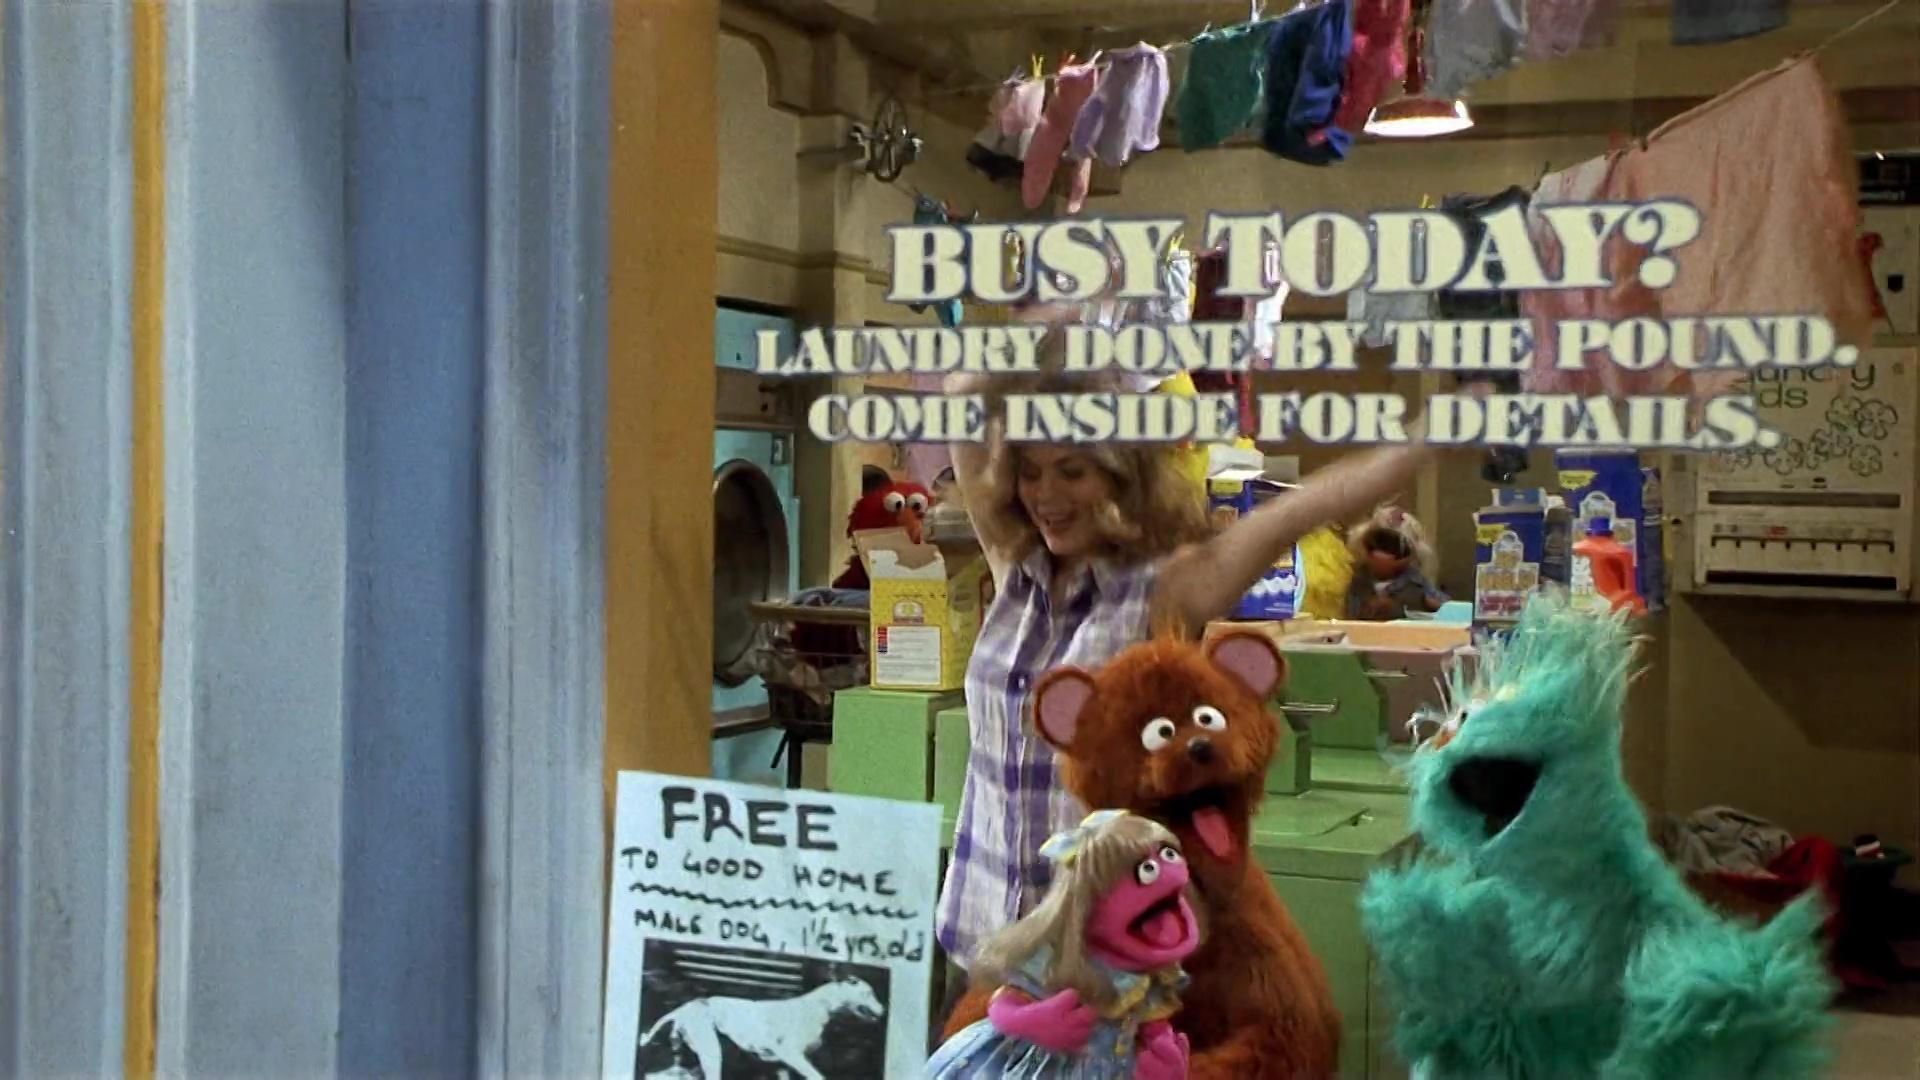 File:Laundromat2.jpg